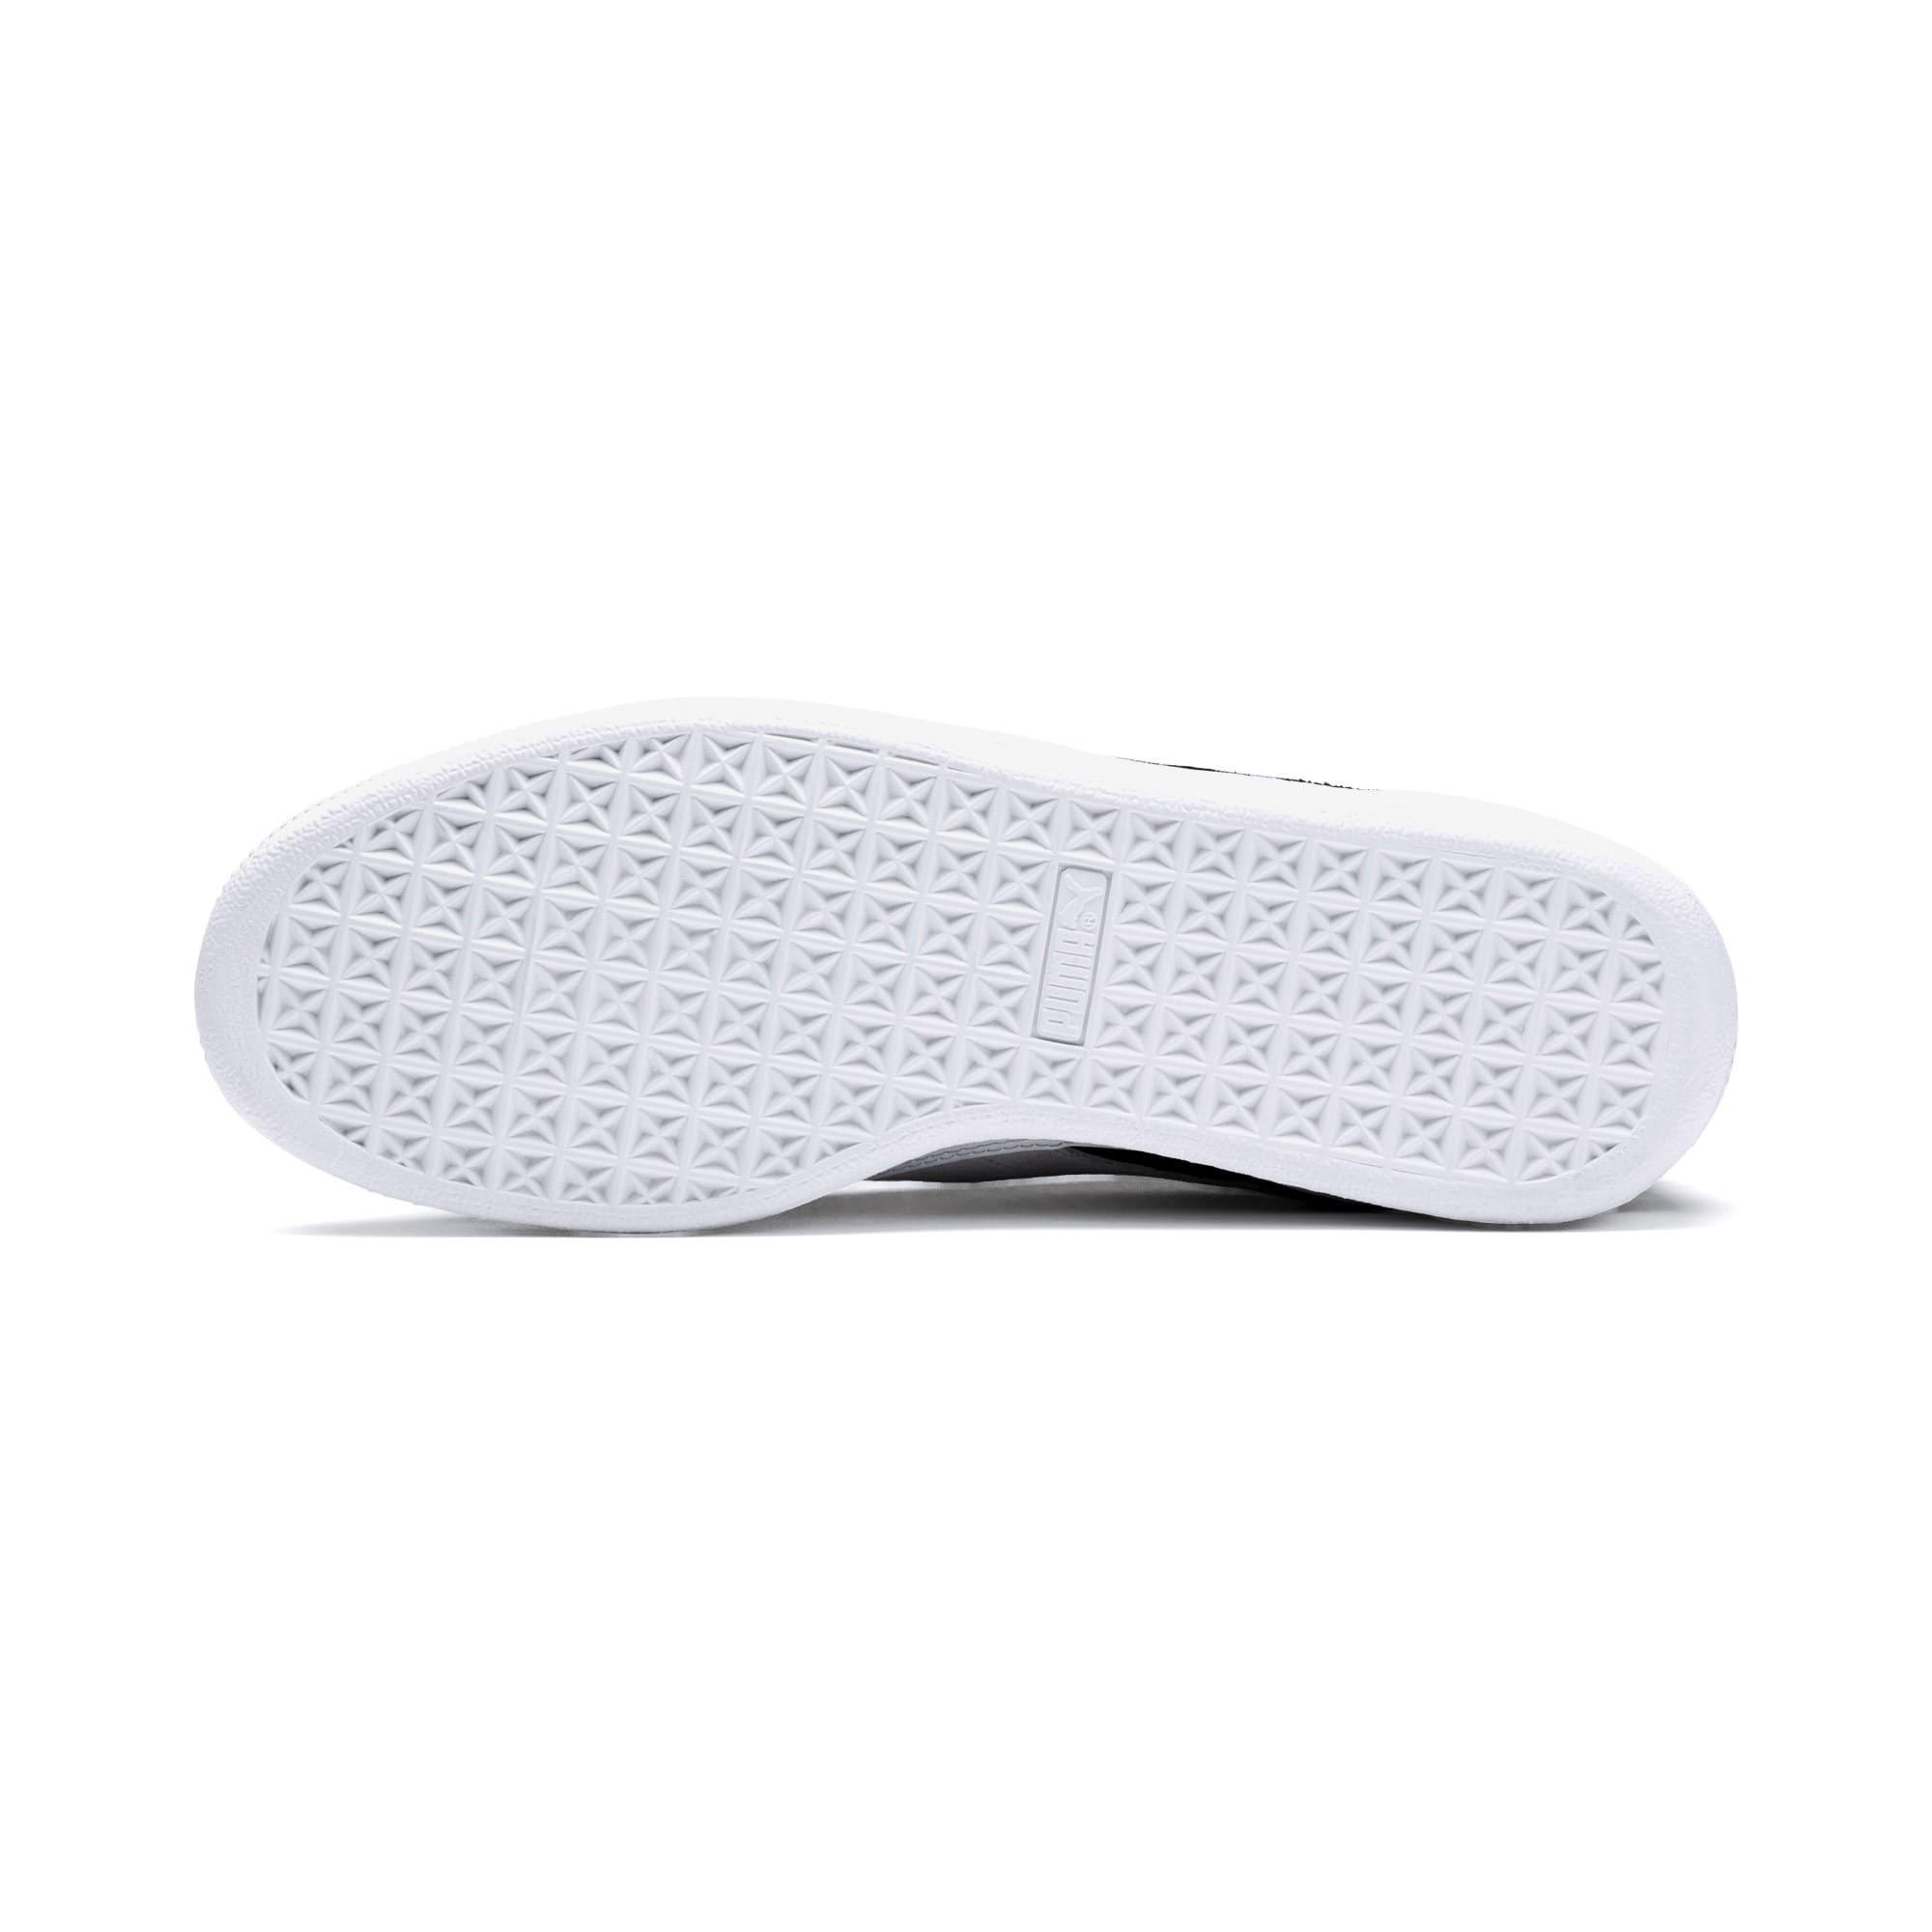 Thumbnail 3 of Suede Skate Sneakers, Puma Black-Puma White, medium